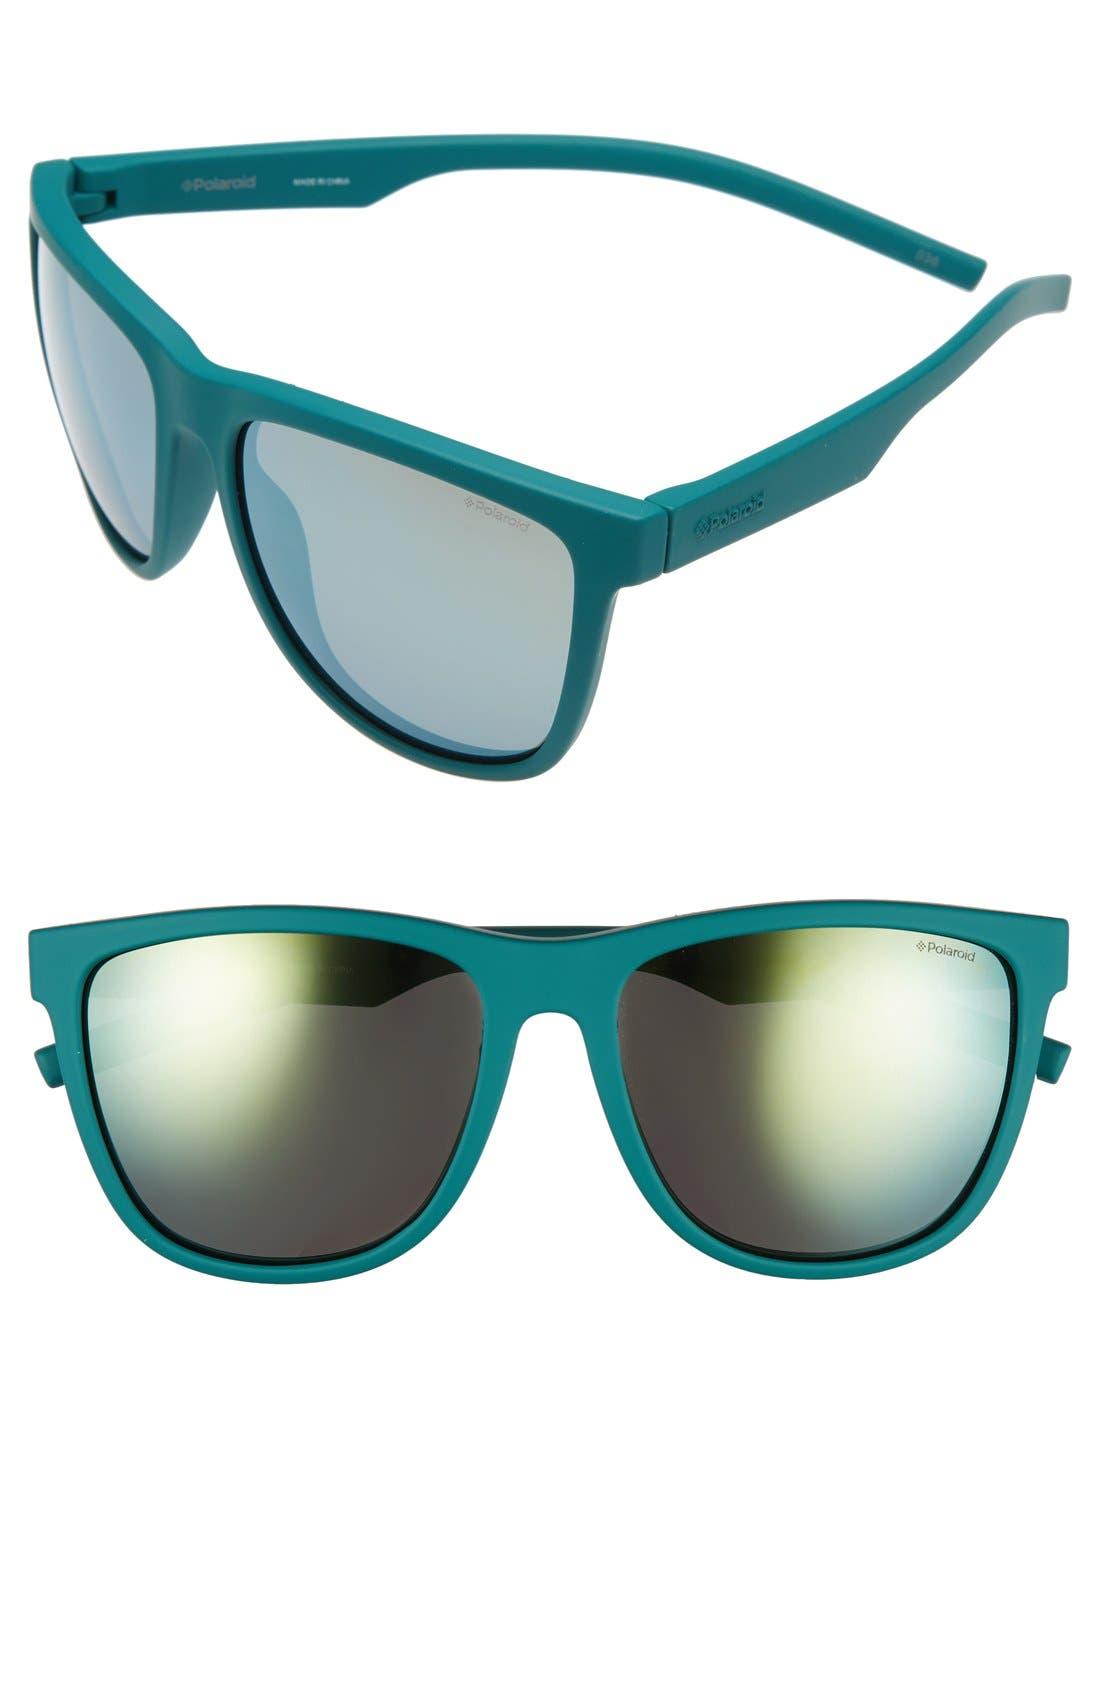 Polaroid 56mm Retro Polarized Sunglasses,                             Main thumbnail 1, color,                             GREEN/ GREY GOLD MIRROR